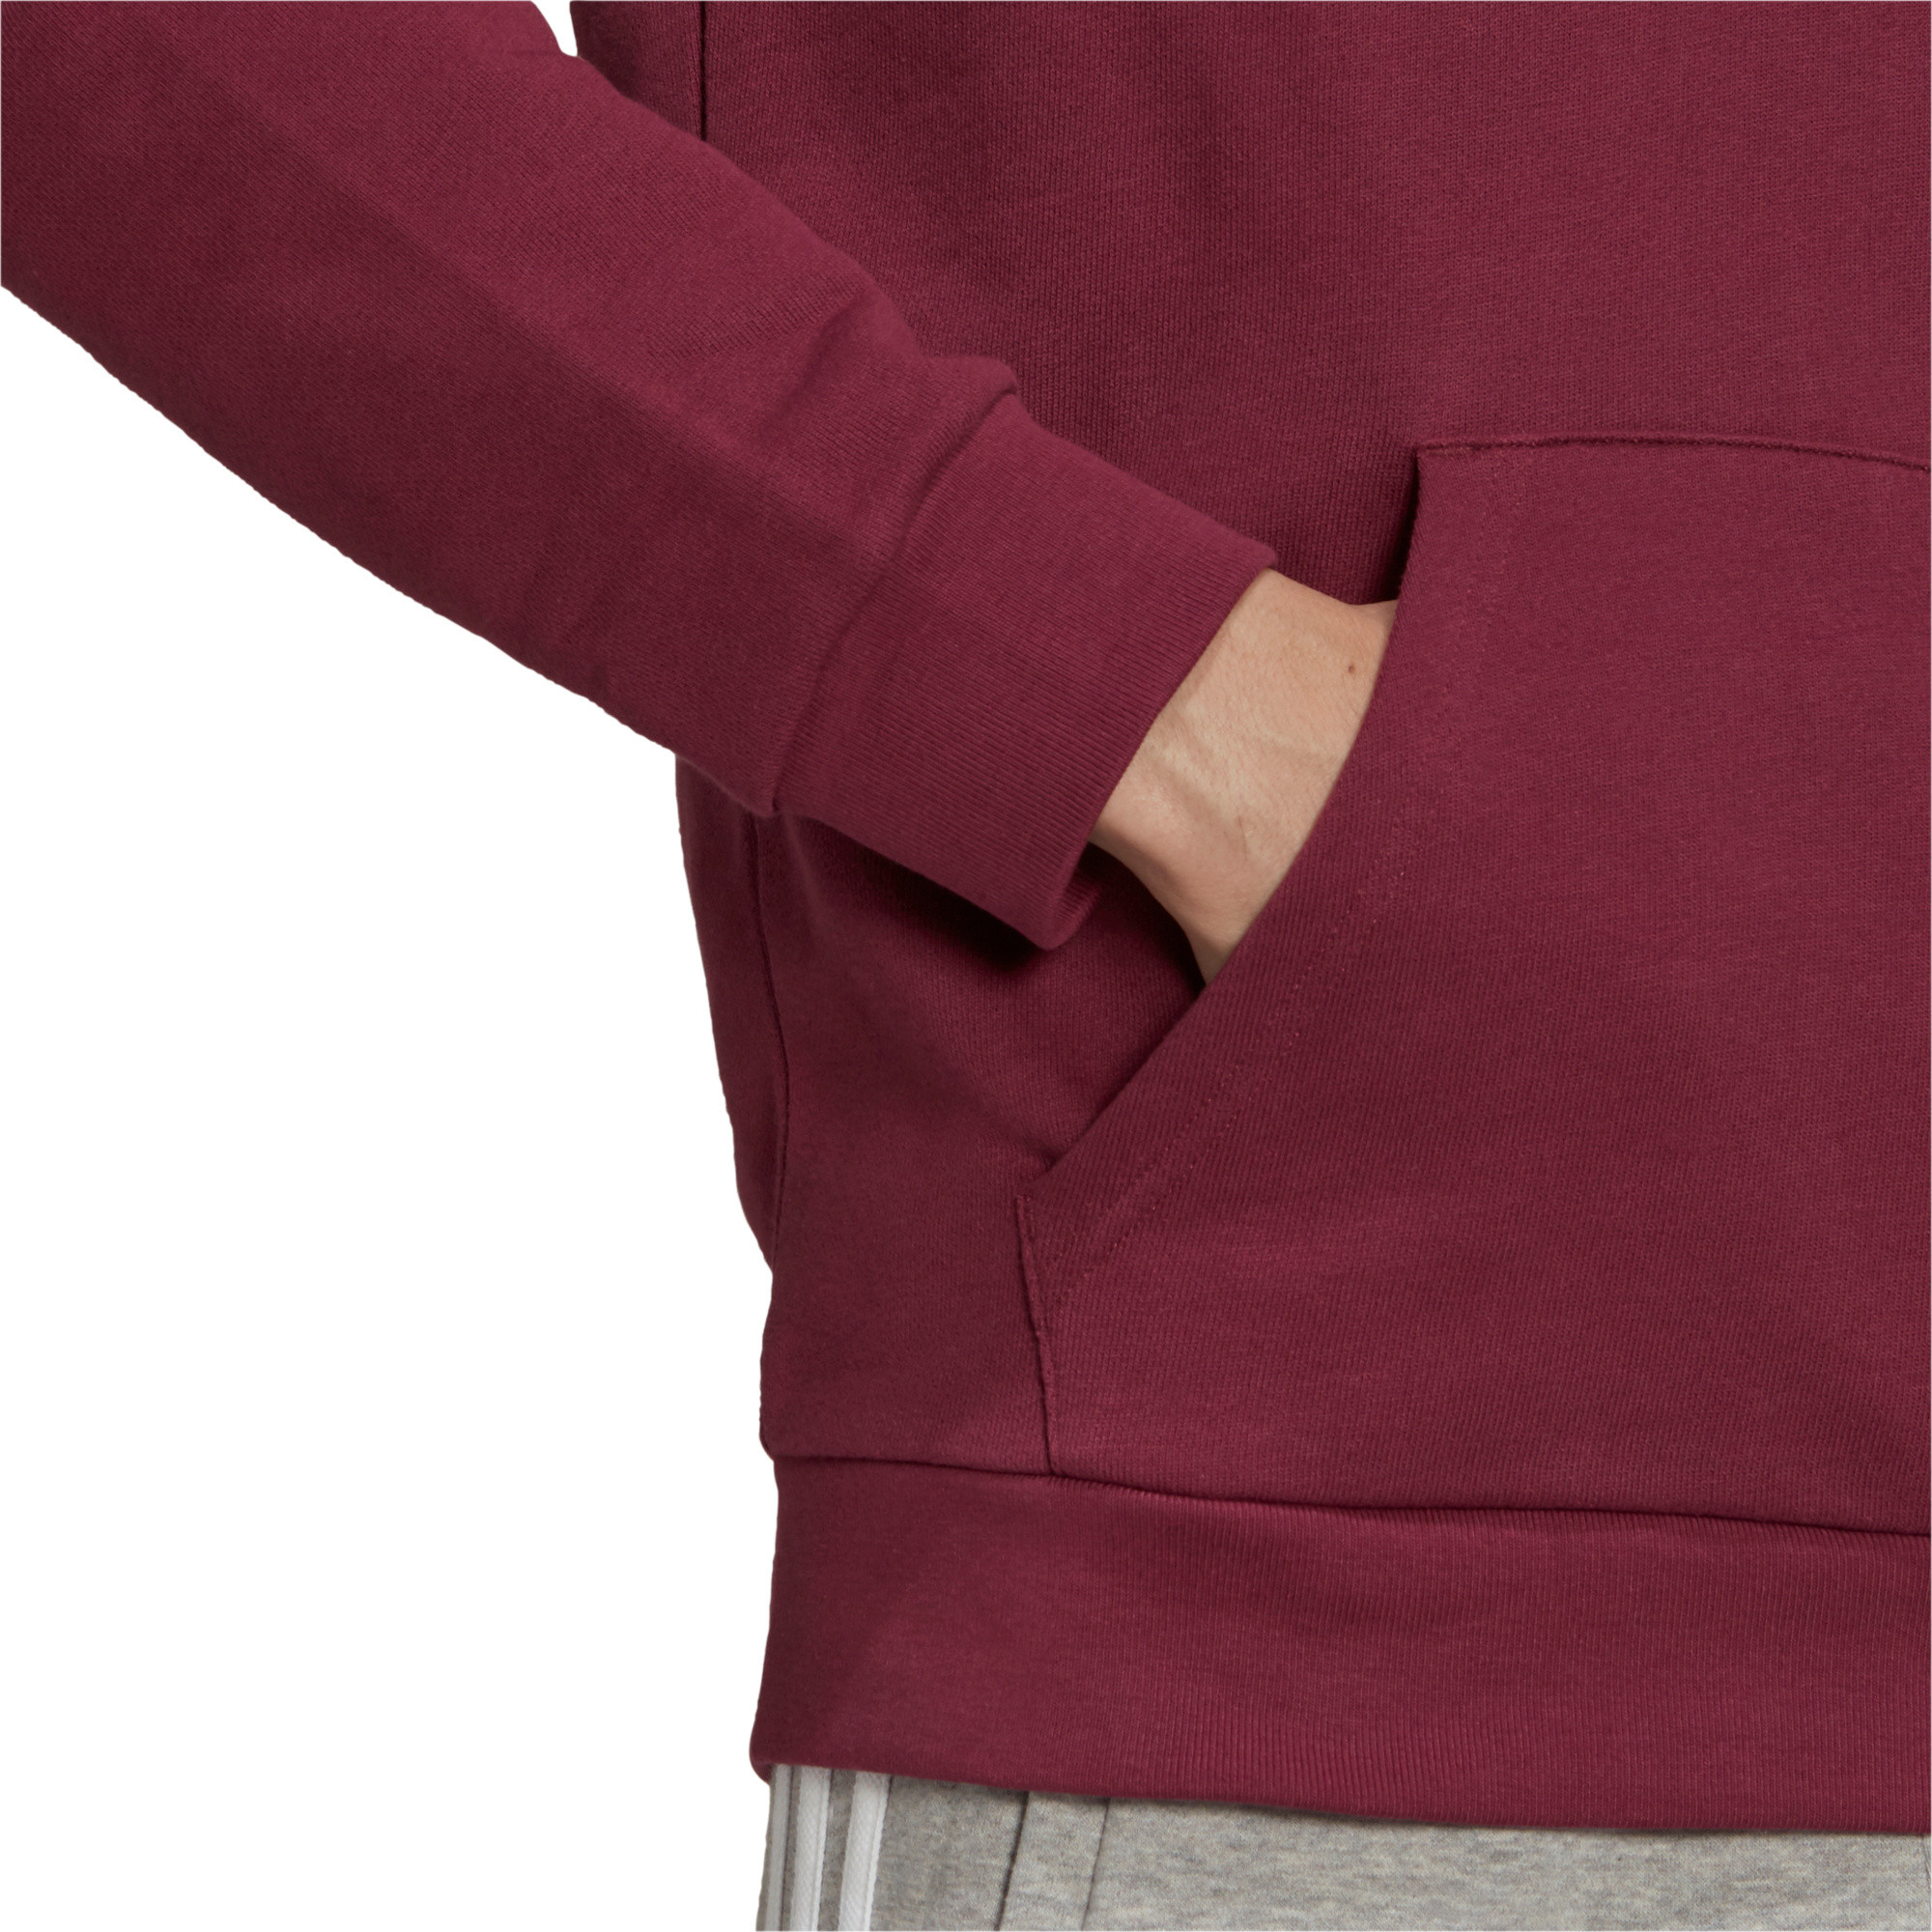 Felpa uomo con cappuccio adicolor Classics Trefoil, Bianco/Rosso, large image number 2